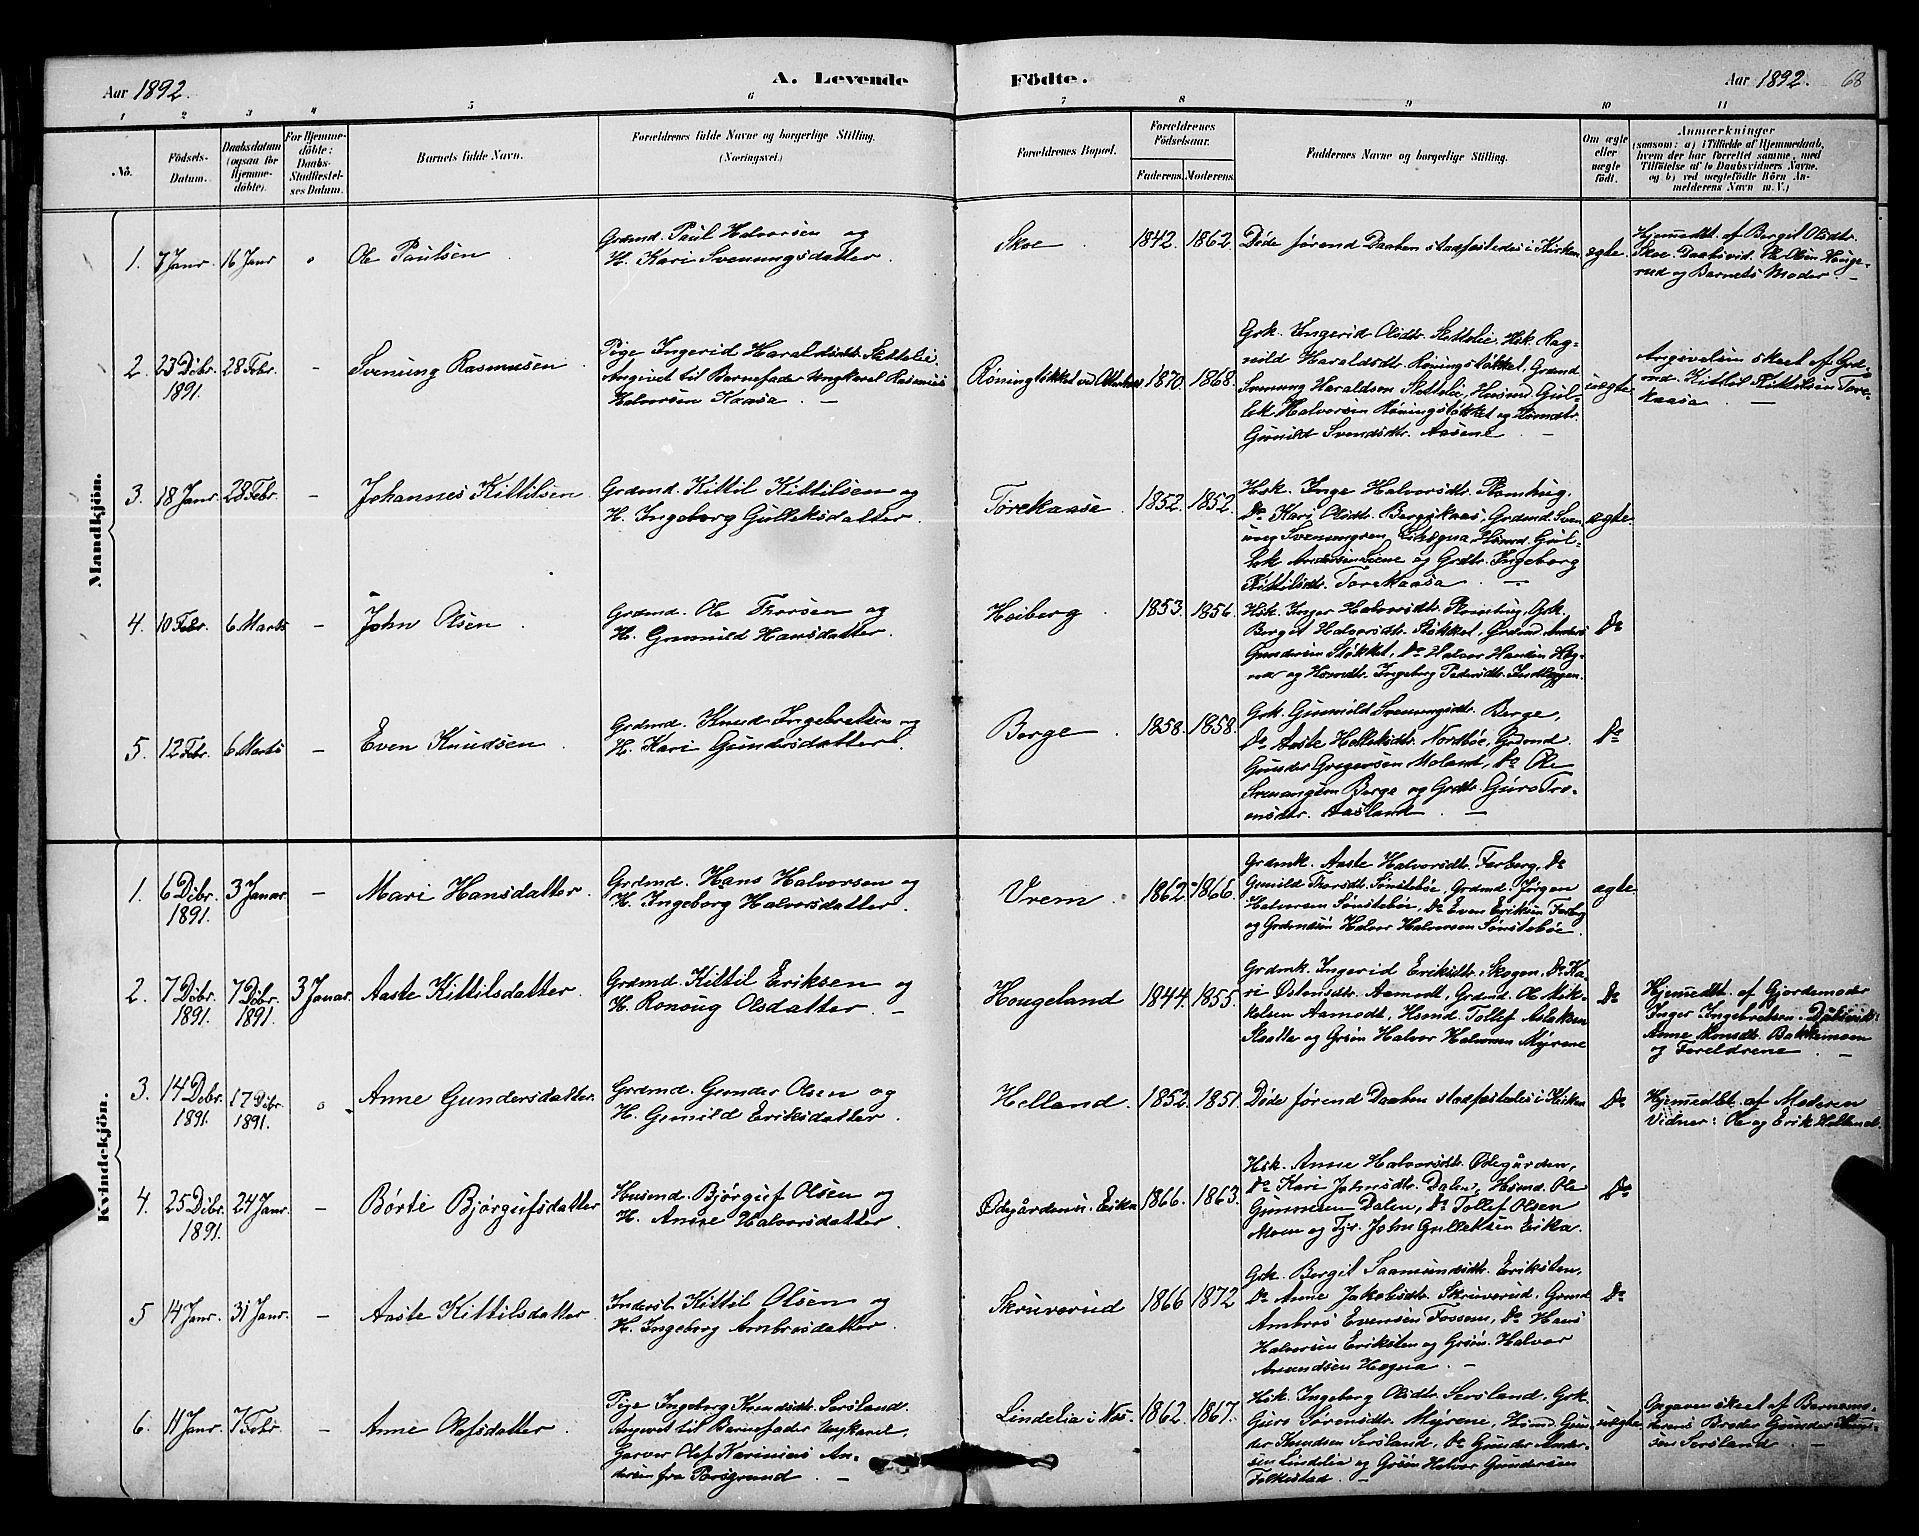 SAKO, Bø kirkebøker, G/Ga/L0005: Klokkerbok nr. 5, 1883-1897, s. 68